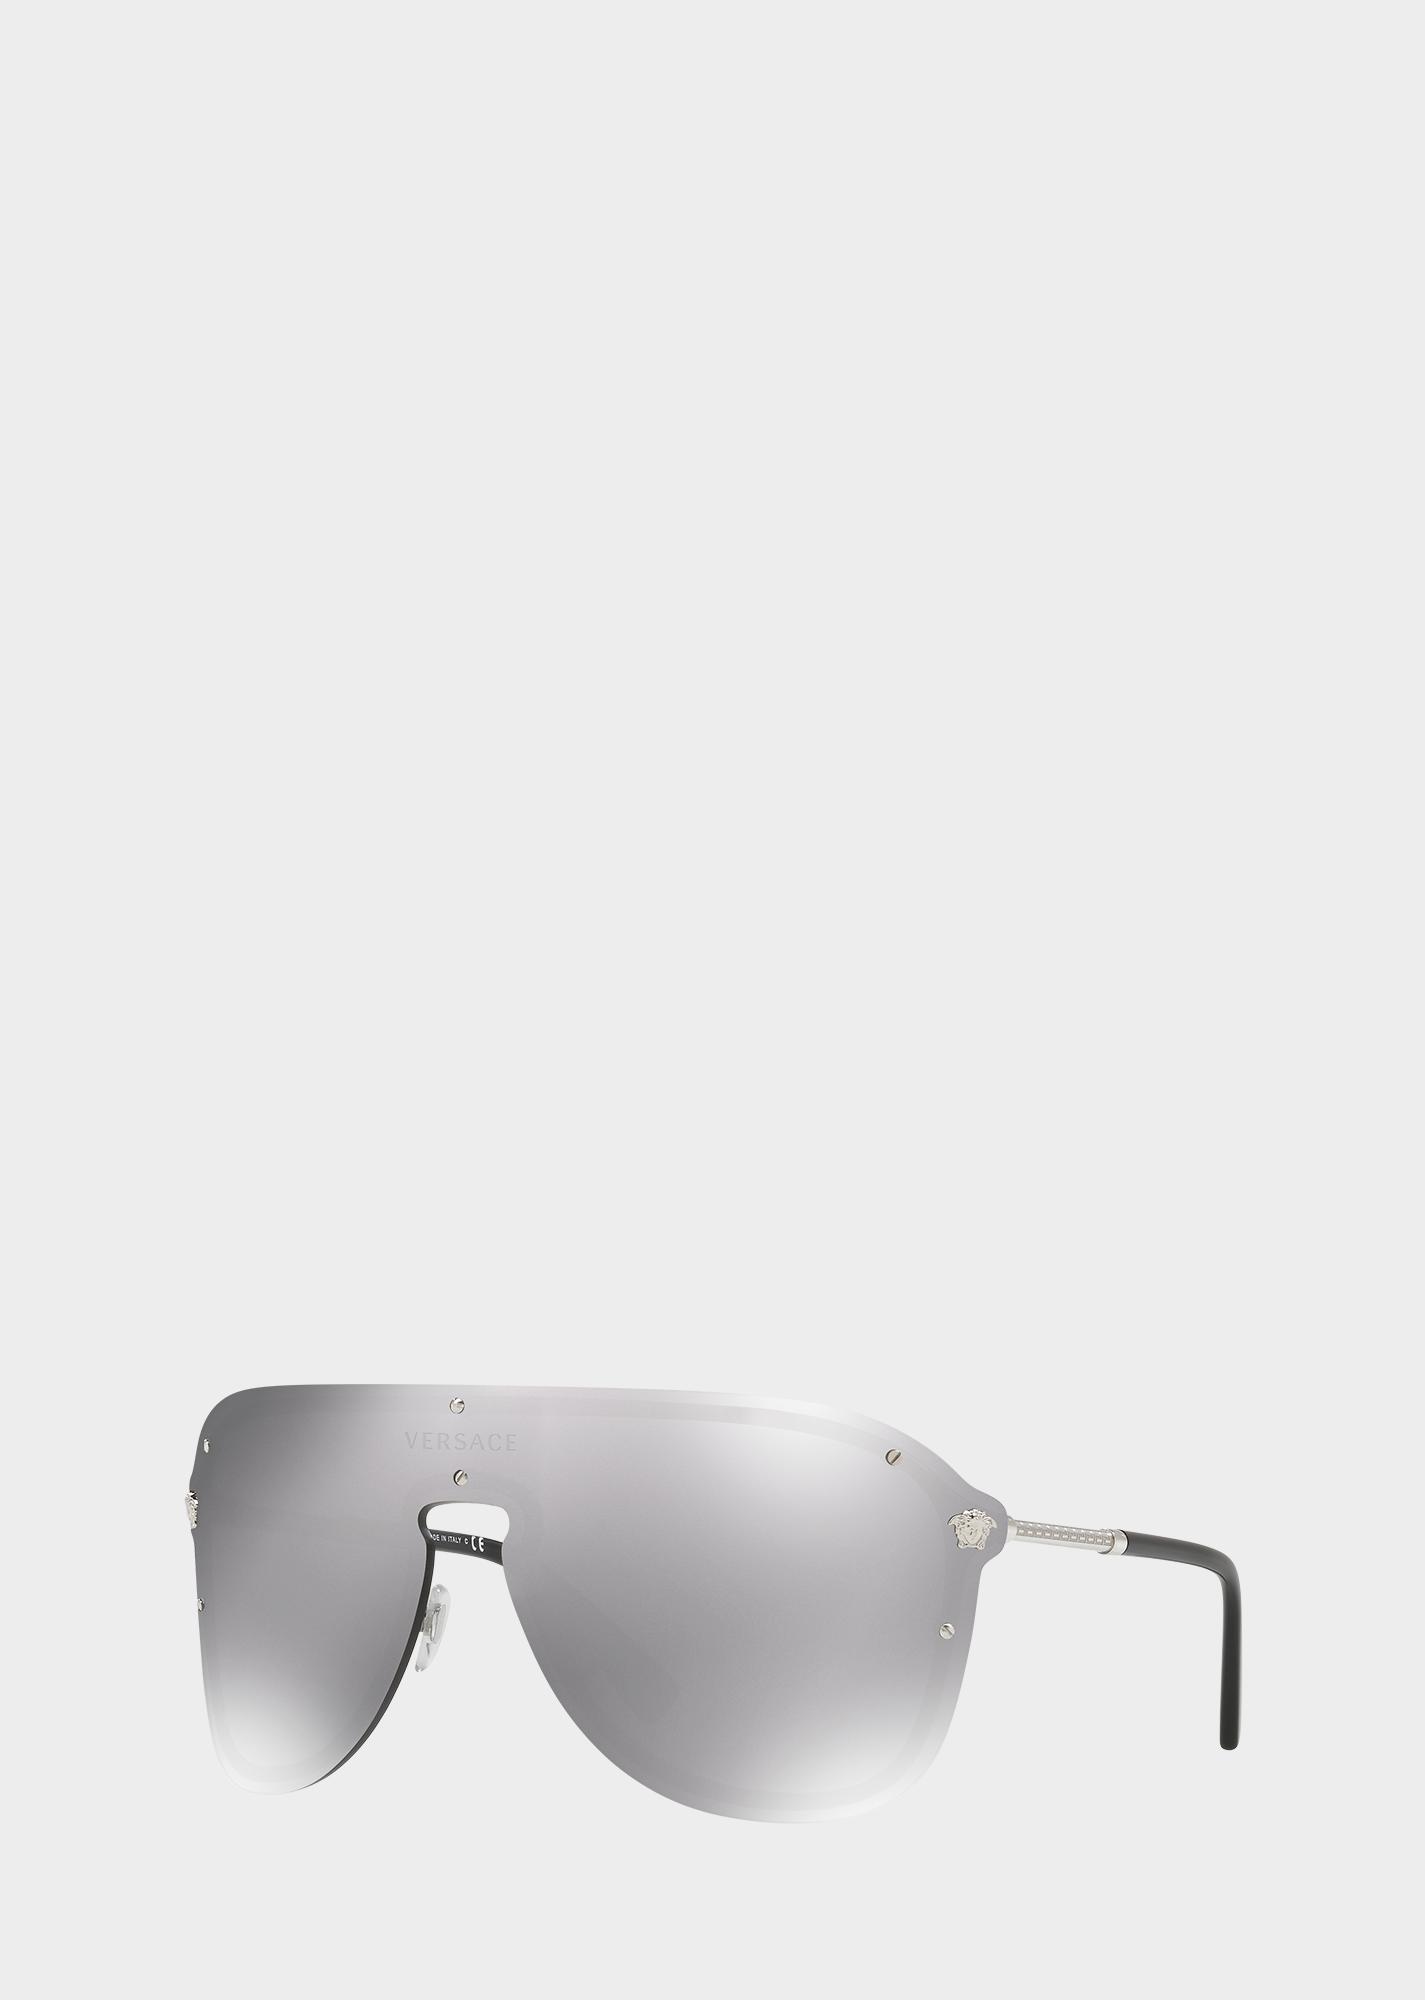 7223b1b78c Silver  Frenergy Visor Sunglasses - ONUL Eyewear